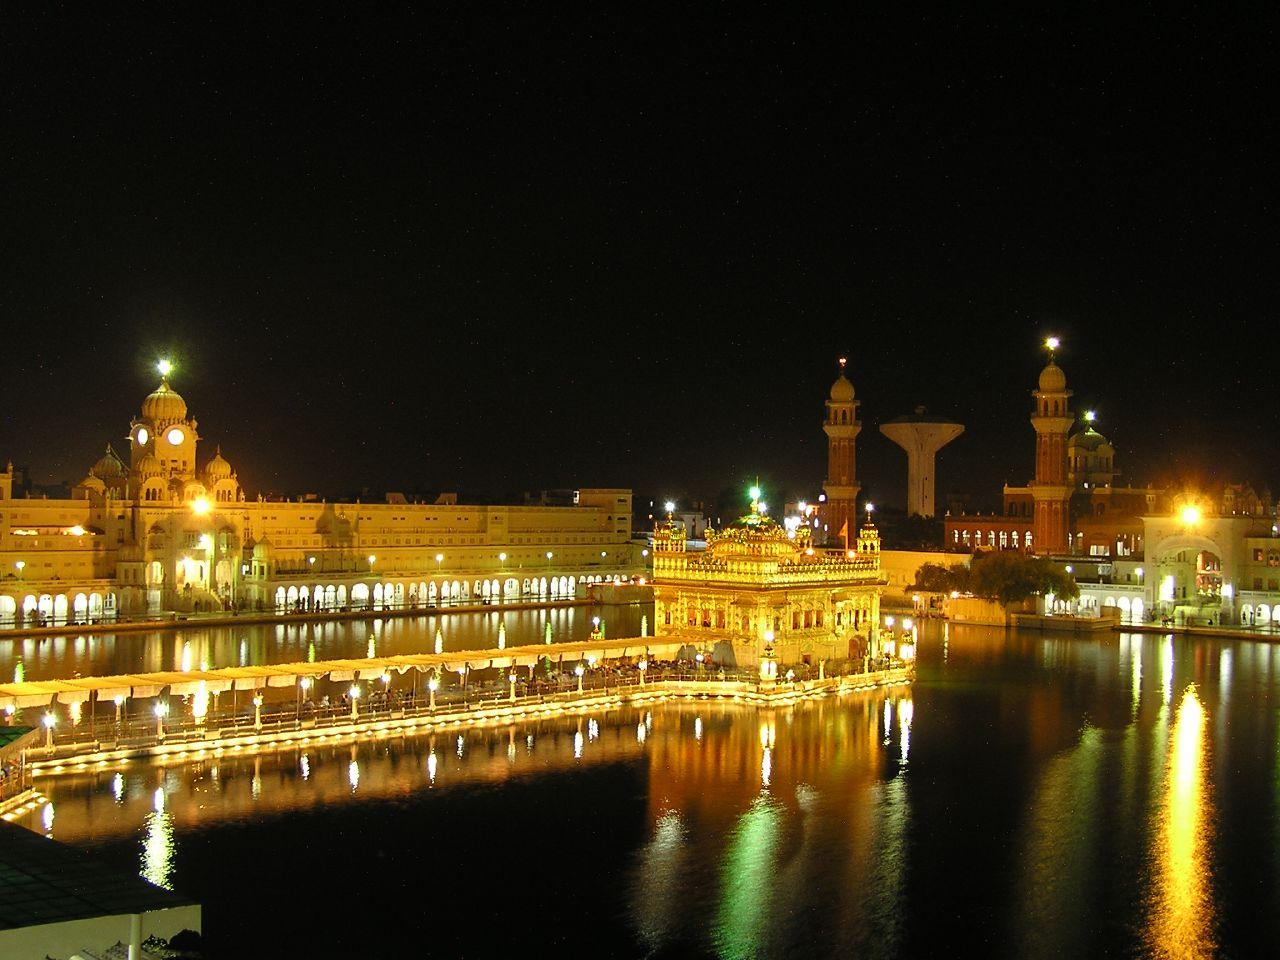 http://3.bp.blogspot.com/_O6DHEpMqQ4E/TArrQykL7mI/AAAAAAAAAHE/lGwR8tZVzwQ/s1600/golden-temple-night.jpg